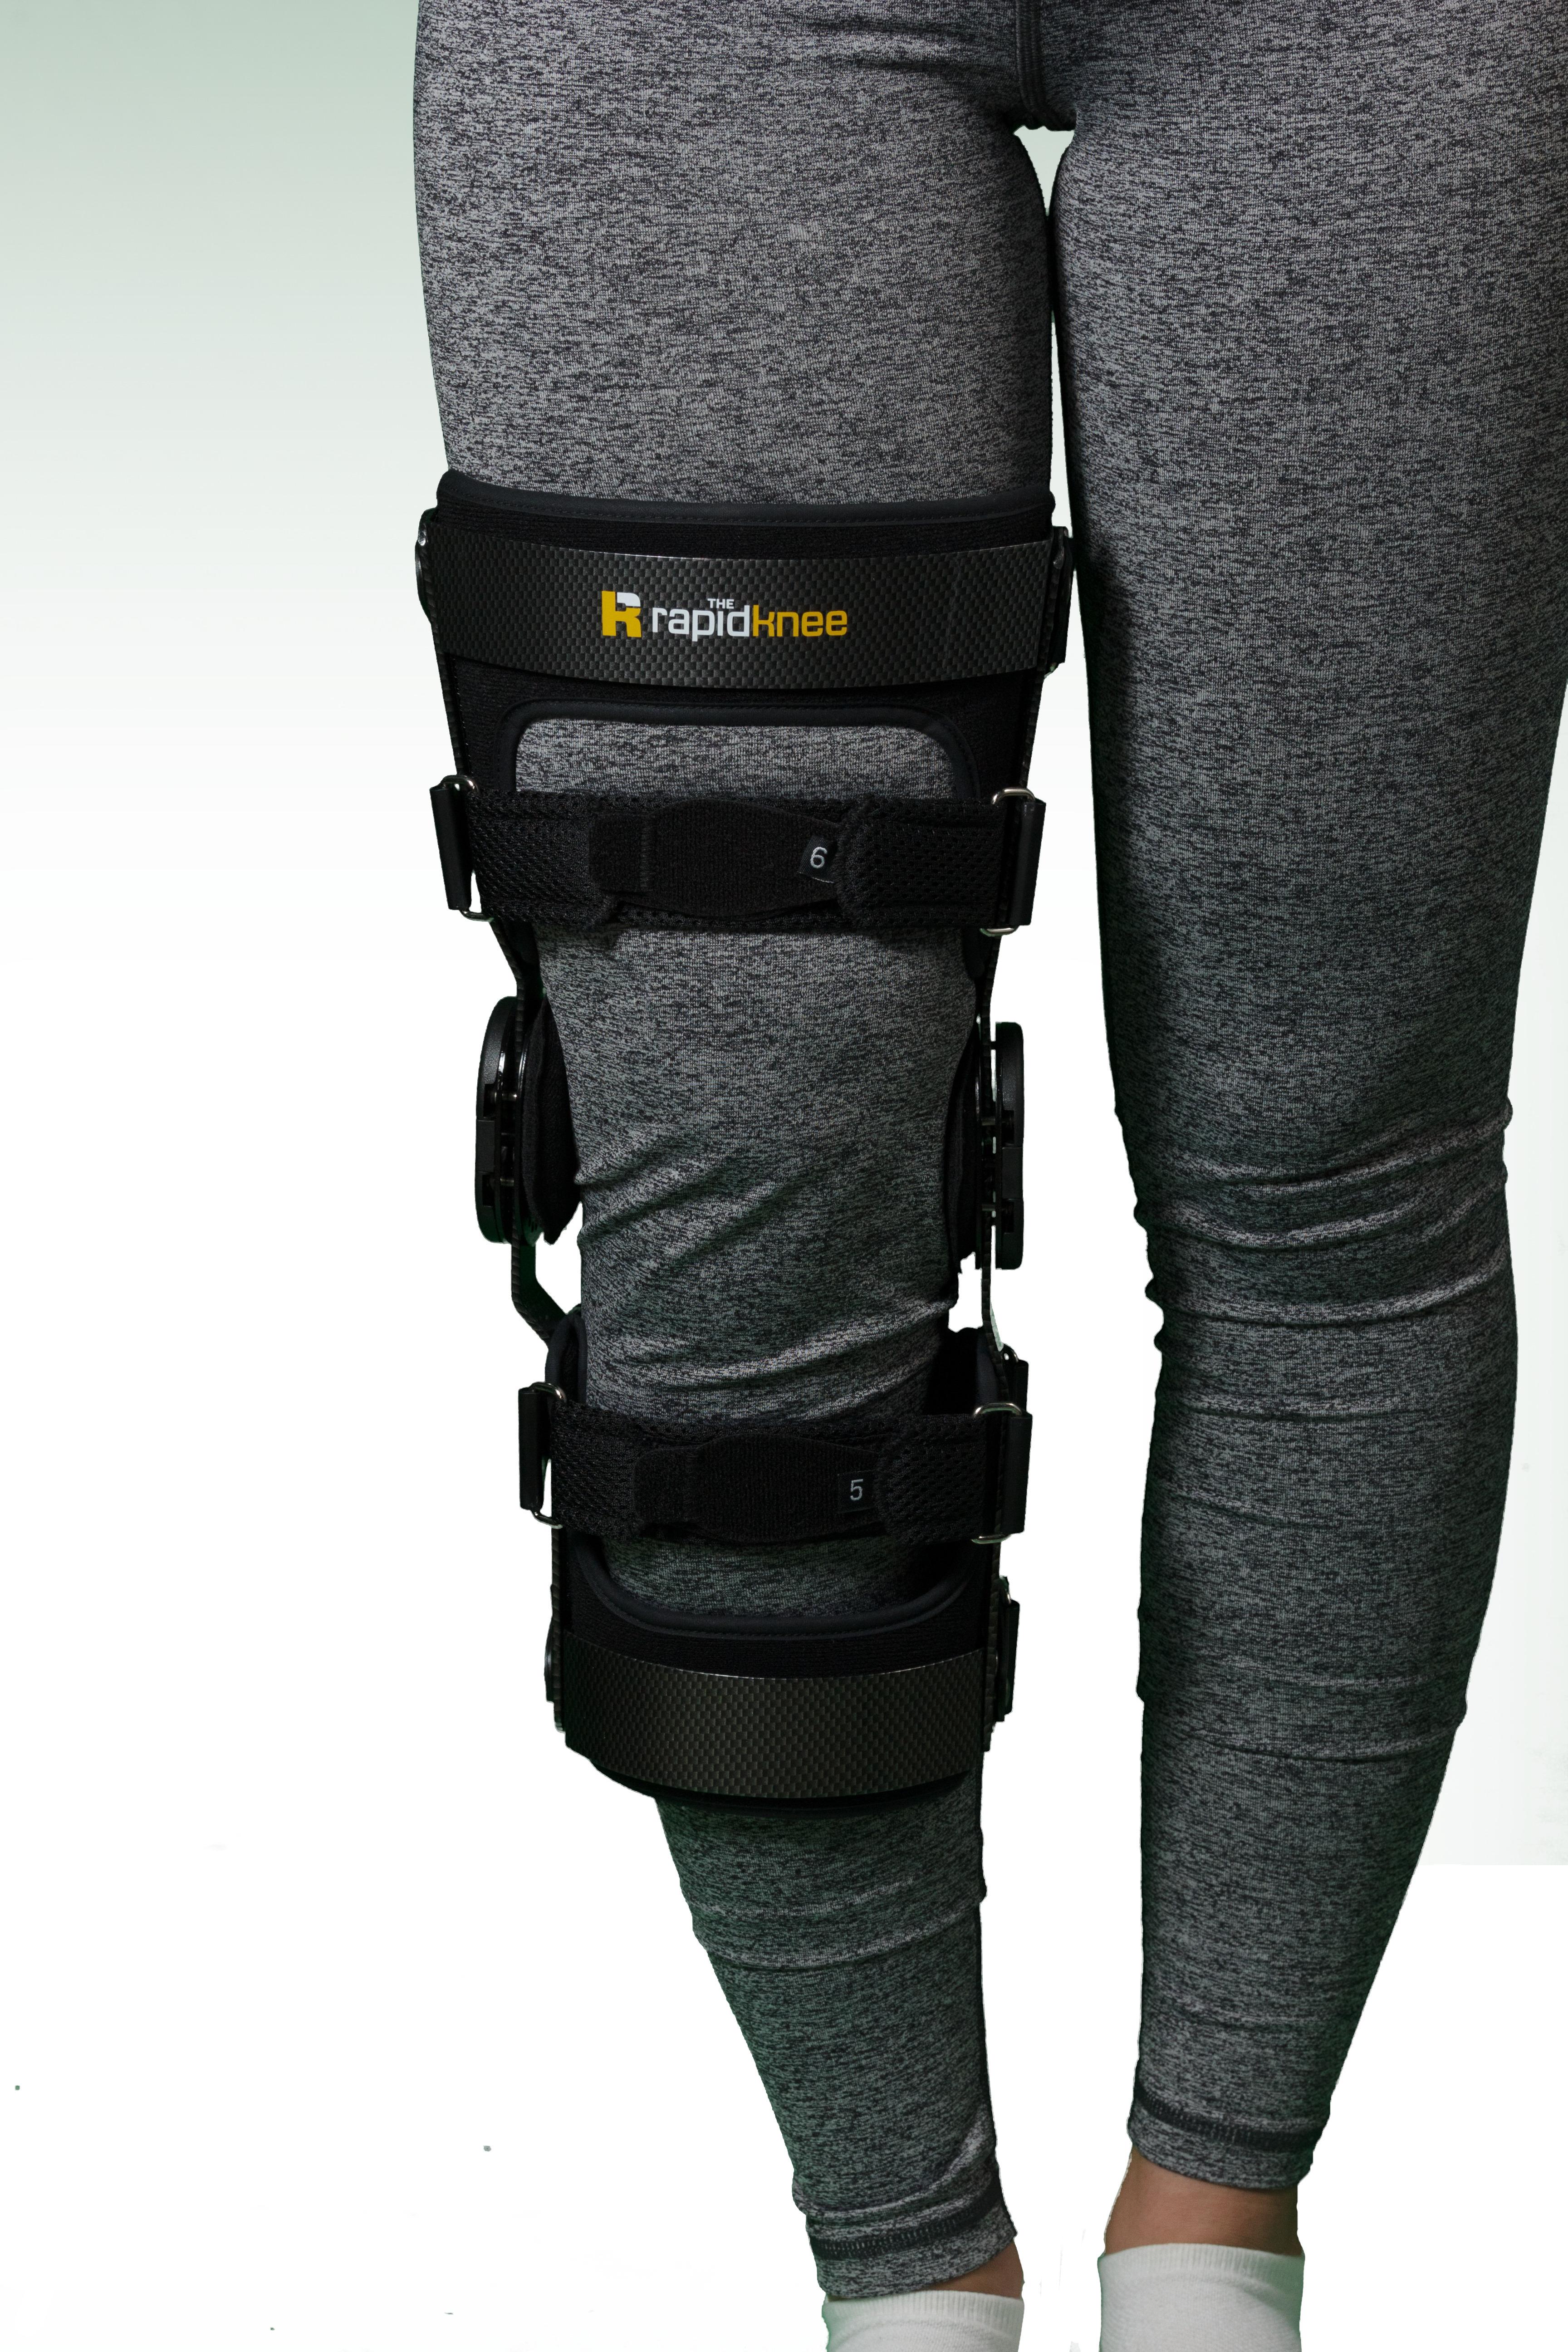 de0b58f444 Rapid Knee L1845 (Rigid Wrap-on Knee brace) - Paintechnology.com